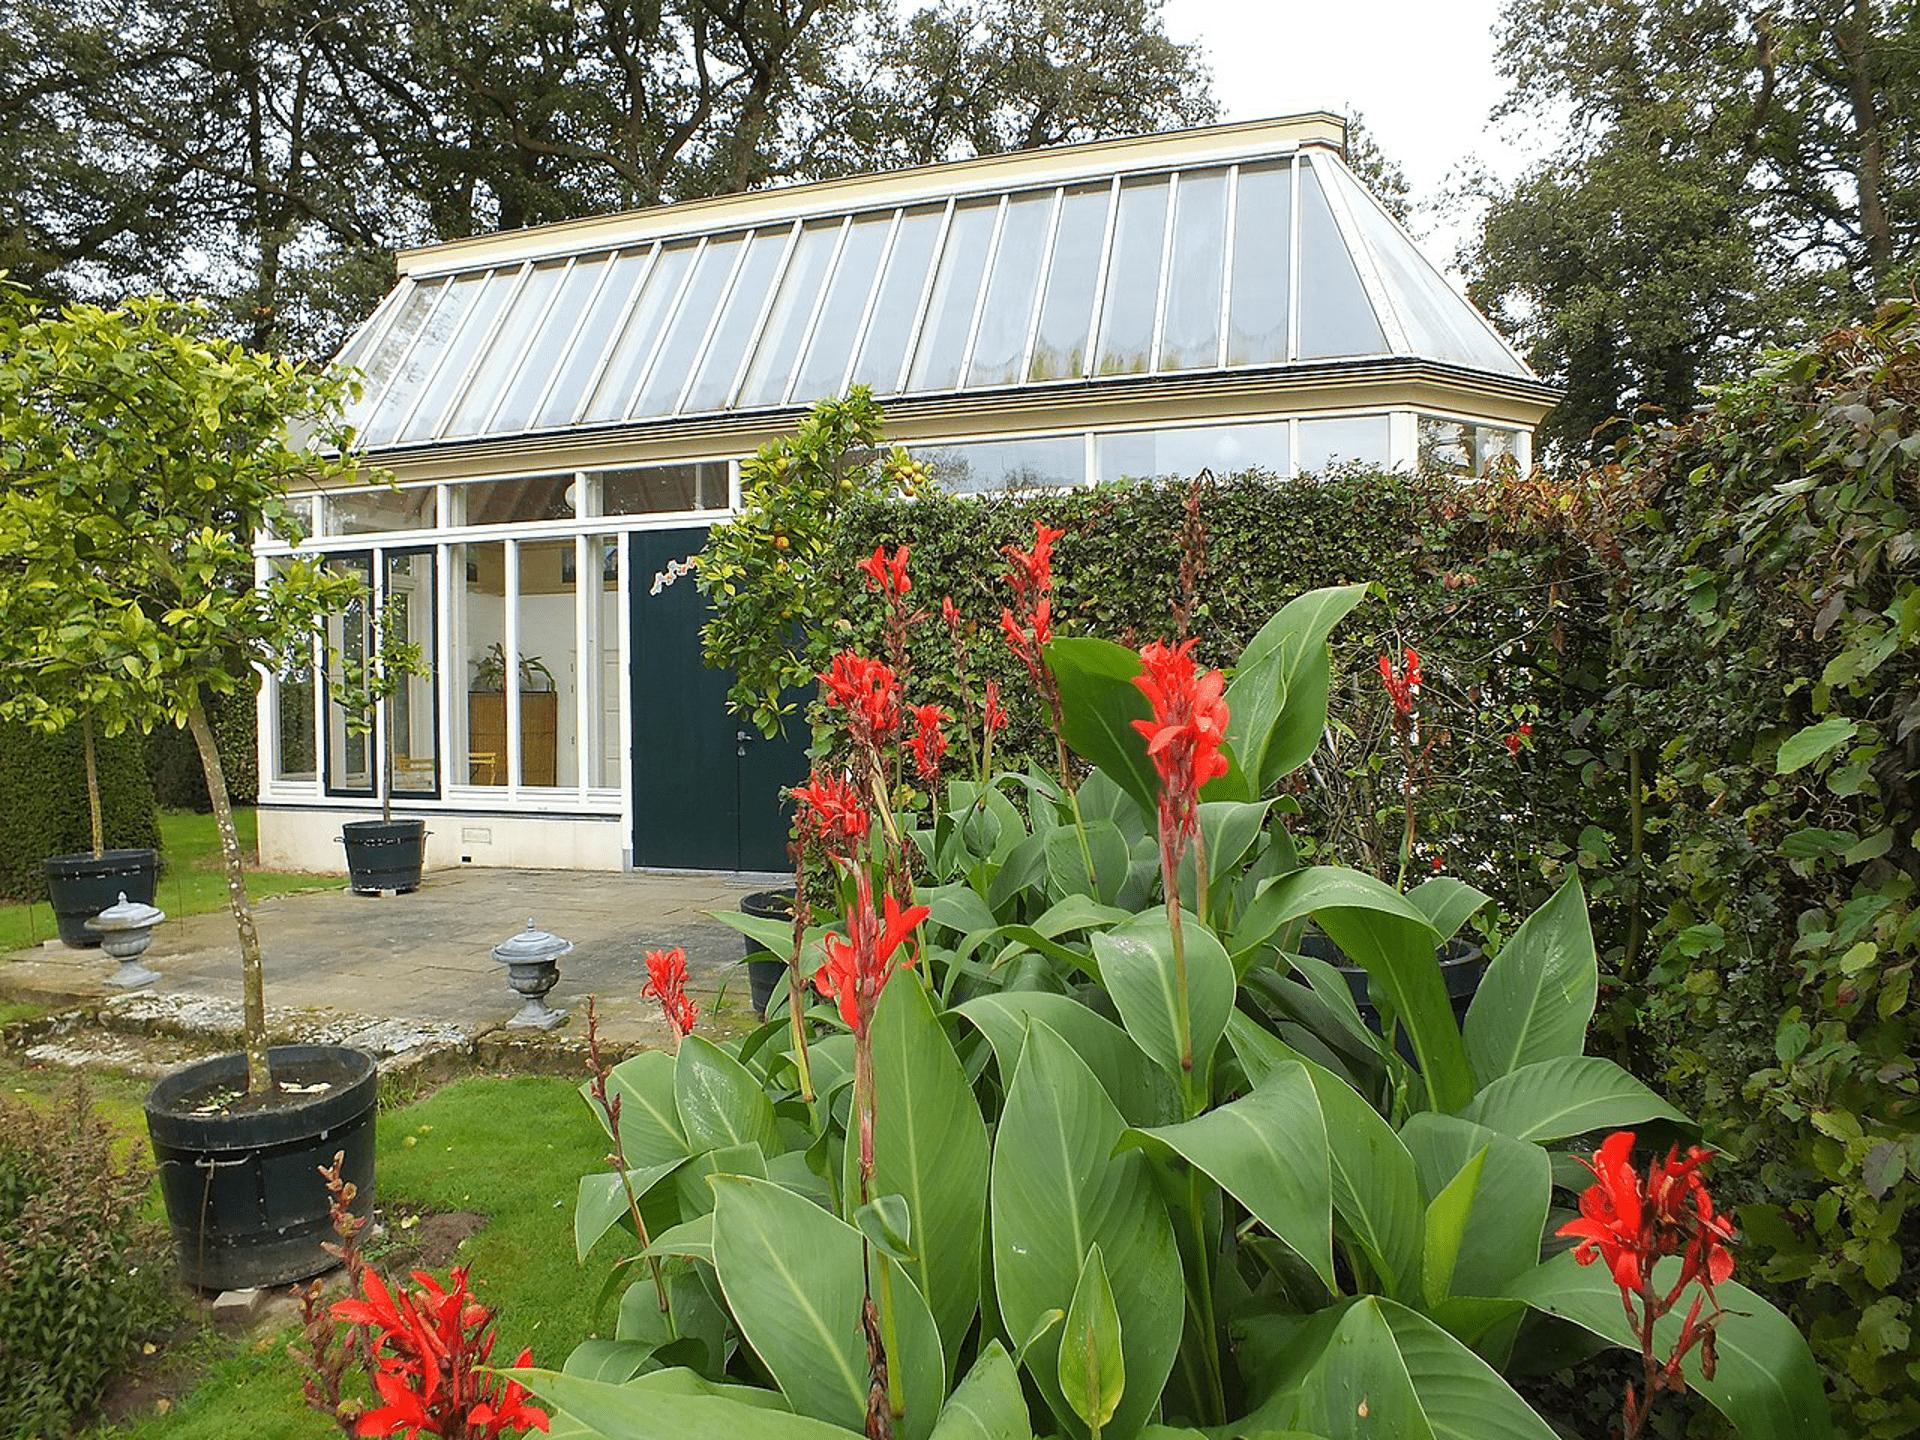 Oranjerie, foto archief Huis te Breckelenkamp